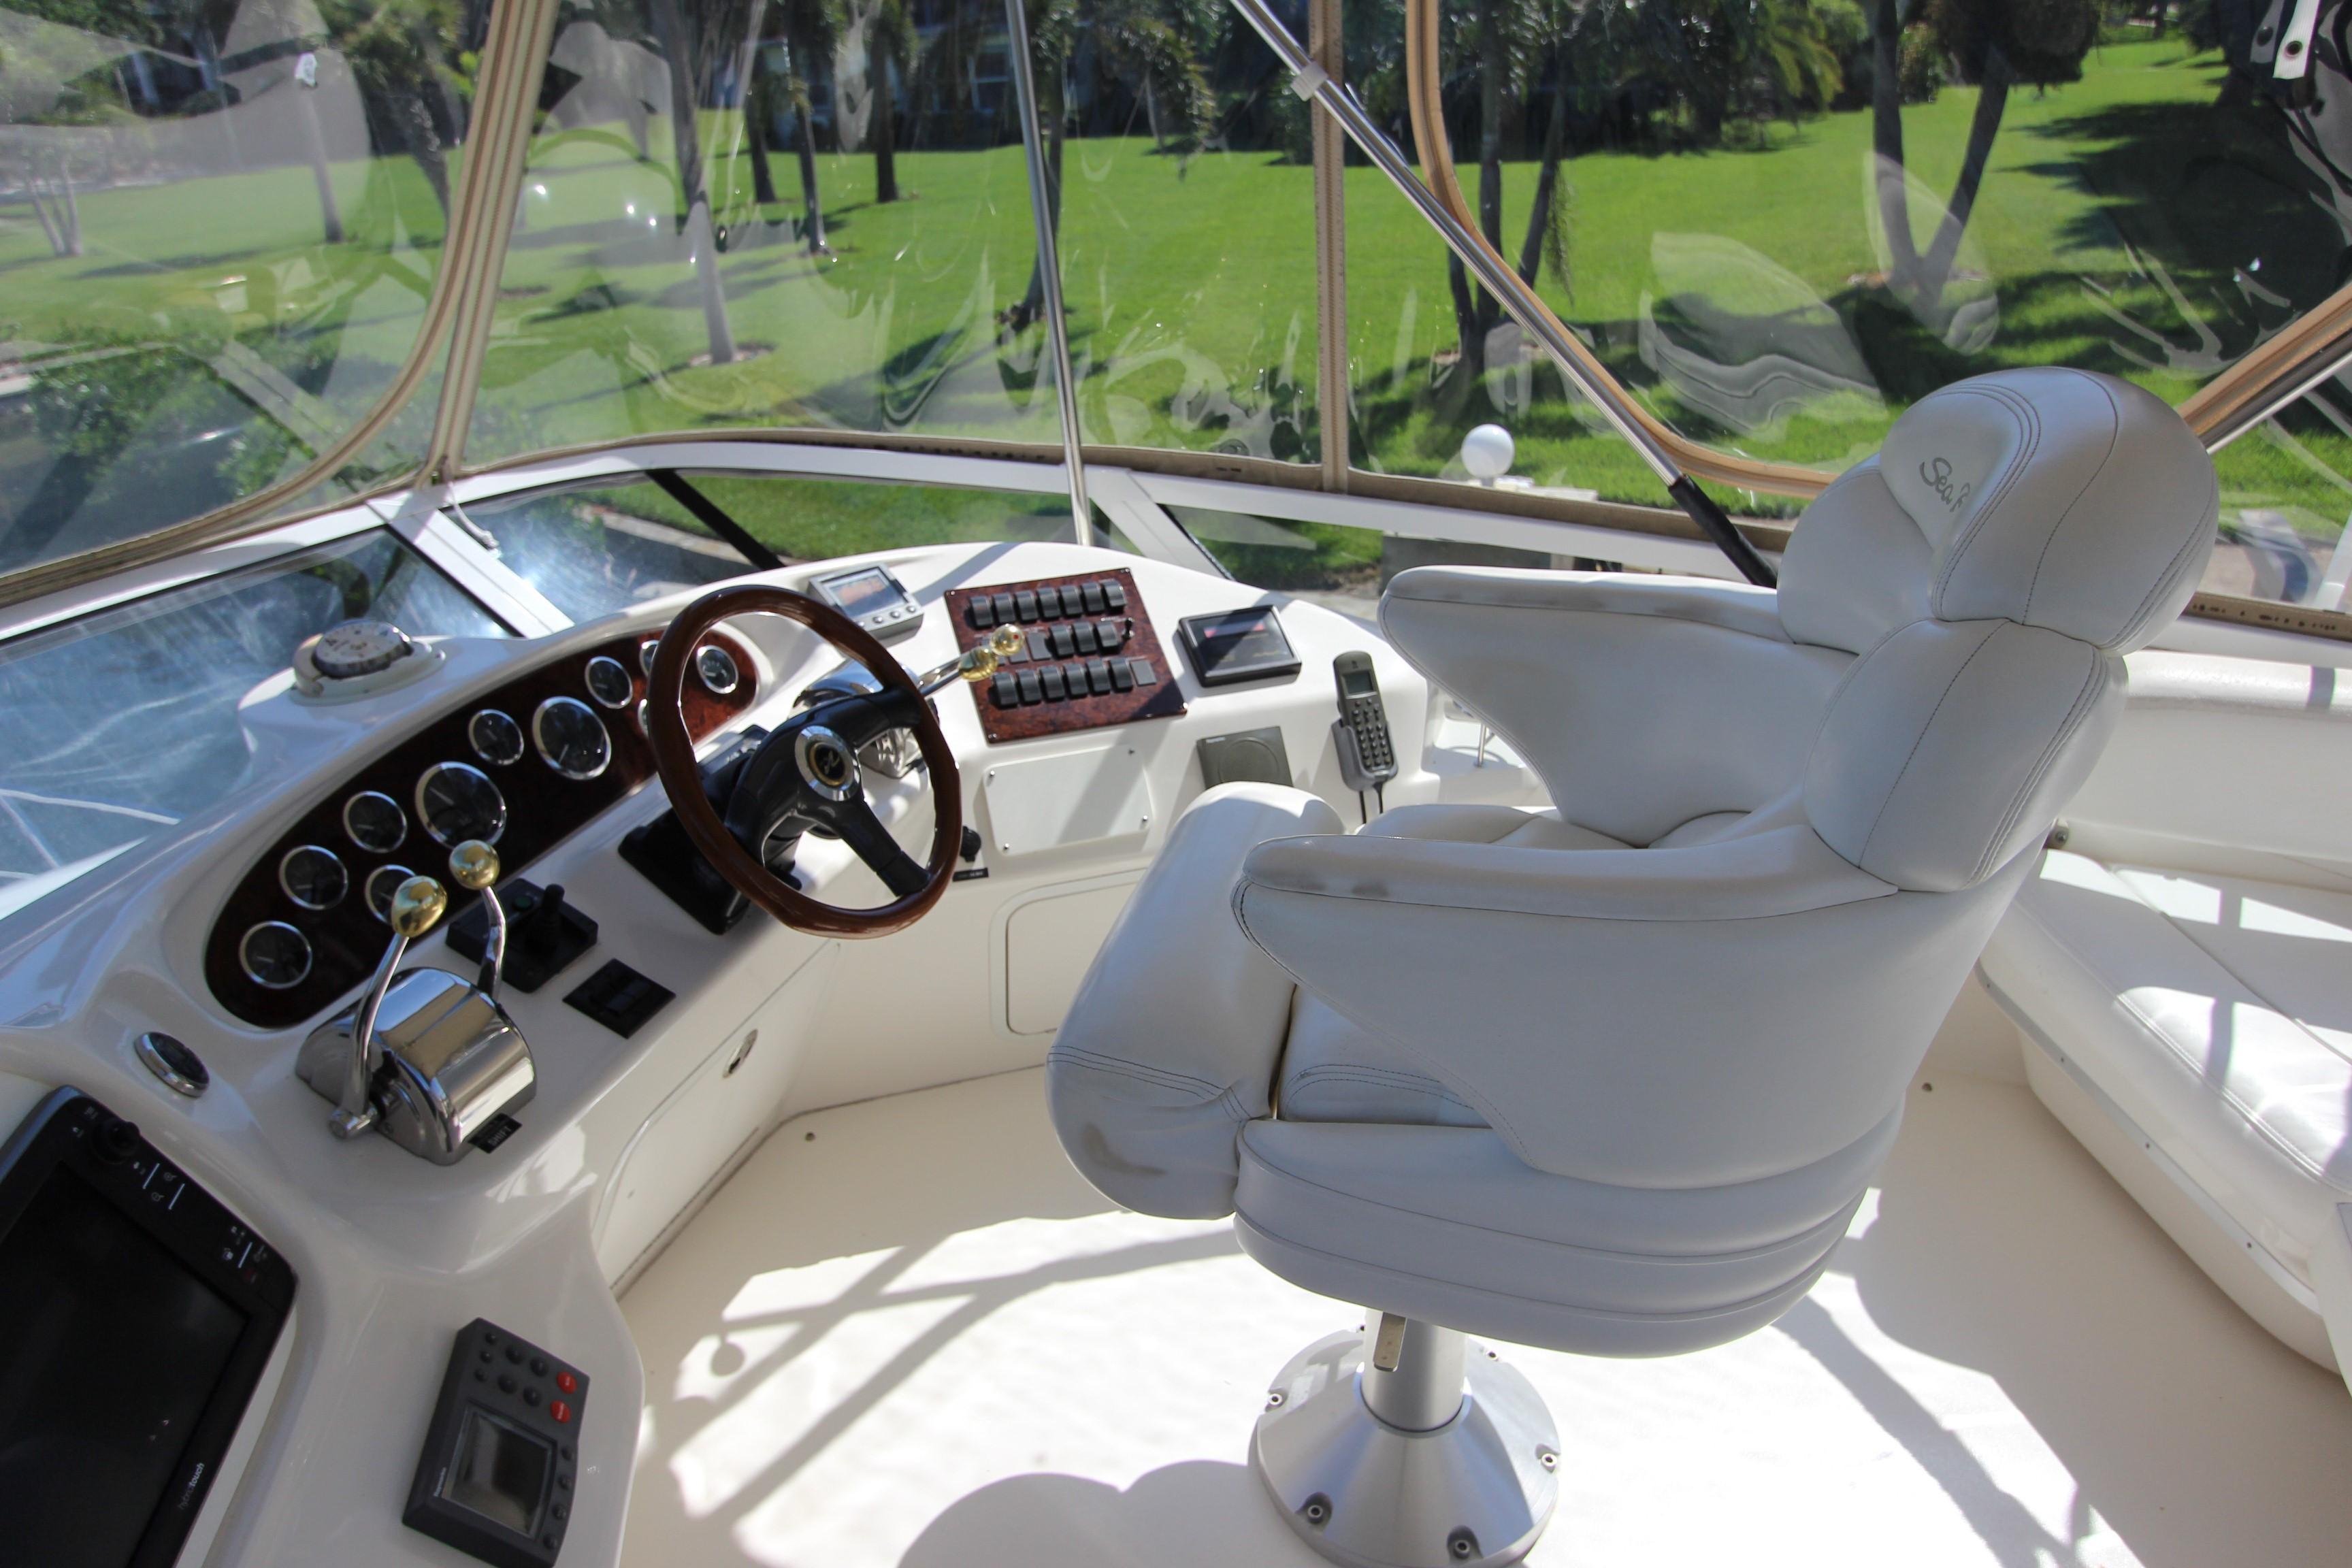 6338999_20170817104403599_1_XLARGE&w=924&h=693&t=1502995534000 2003 sea ray 400 sedan bridge power boat for sale www yachtworld com  at webbmarketing.co